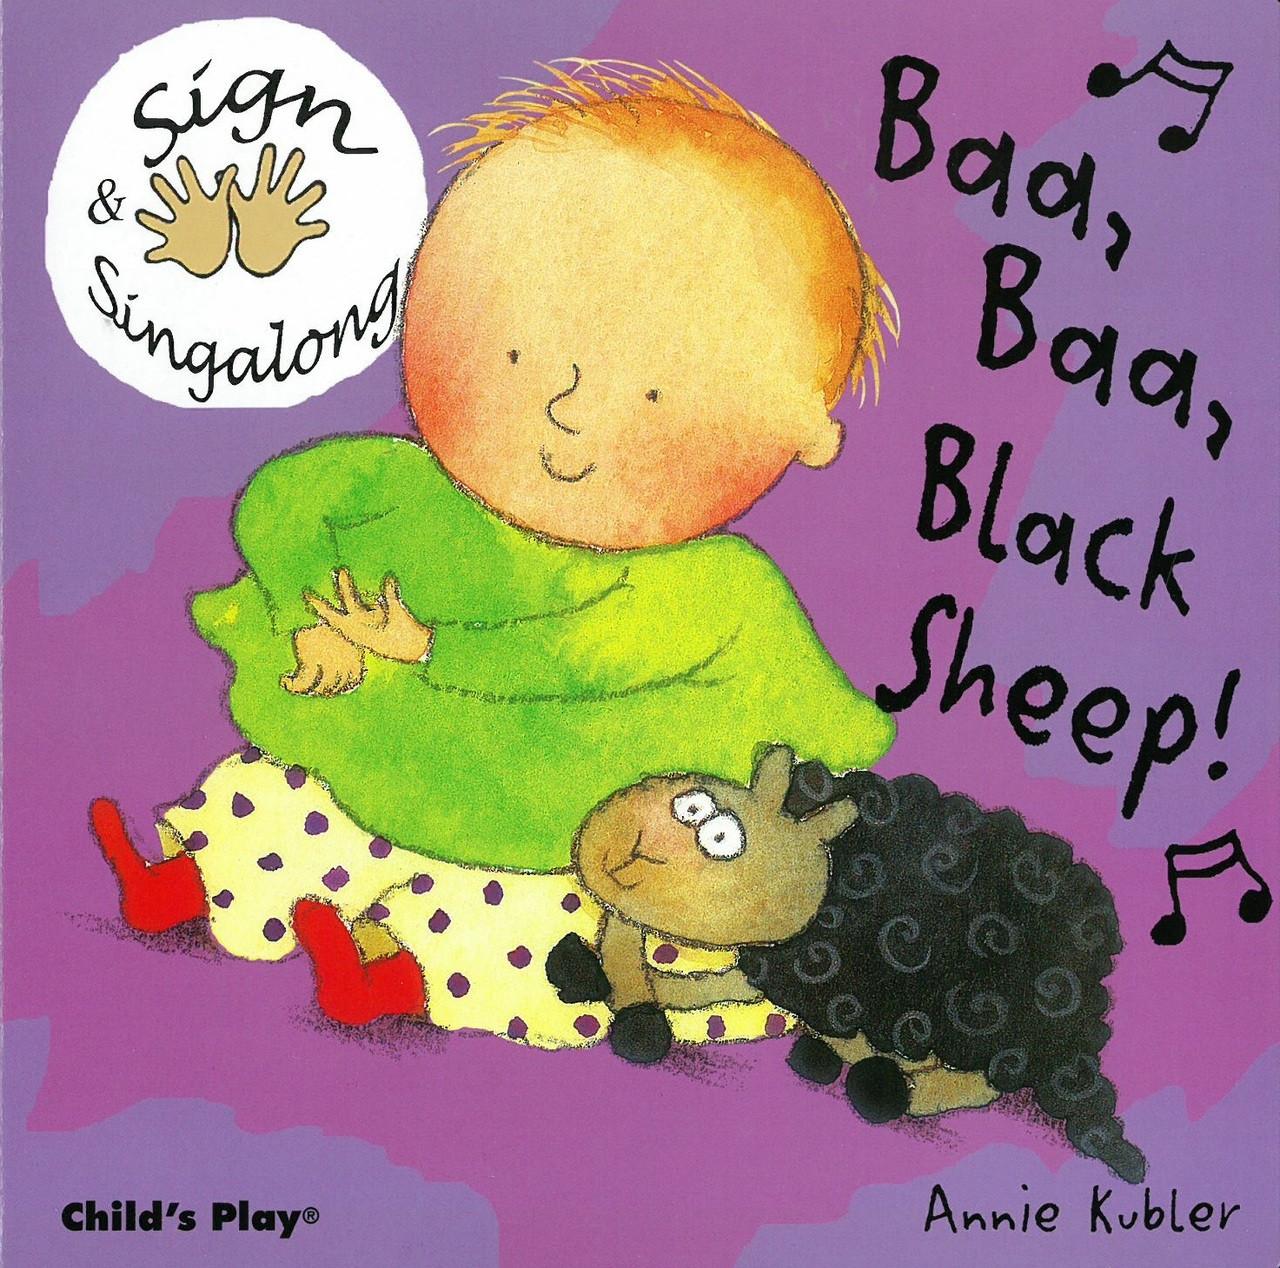 Baa Baa Black Sheep: Sign & Sing Along (Board Book) - Books By The ...